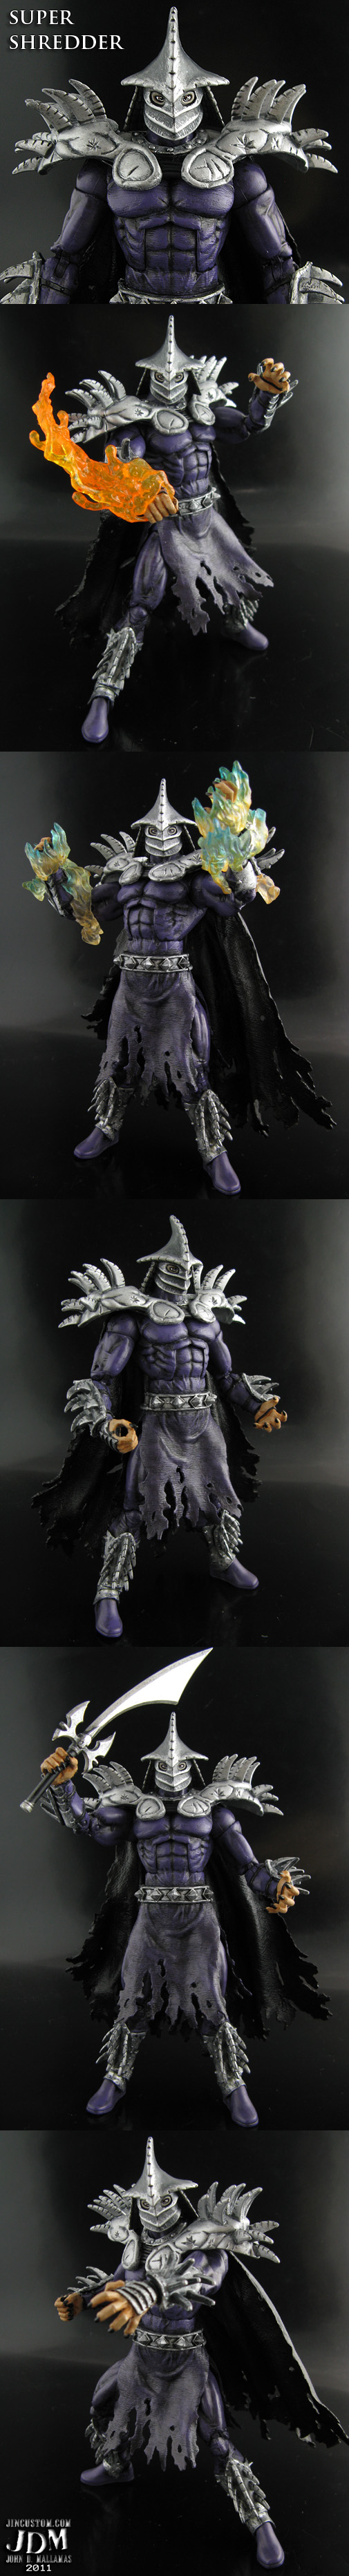 Super Shredder by Jin-Saotome